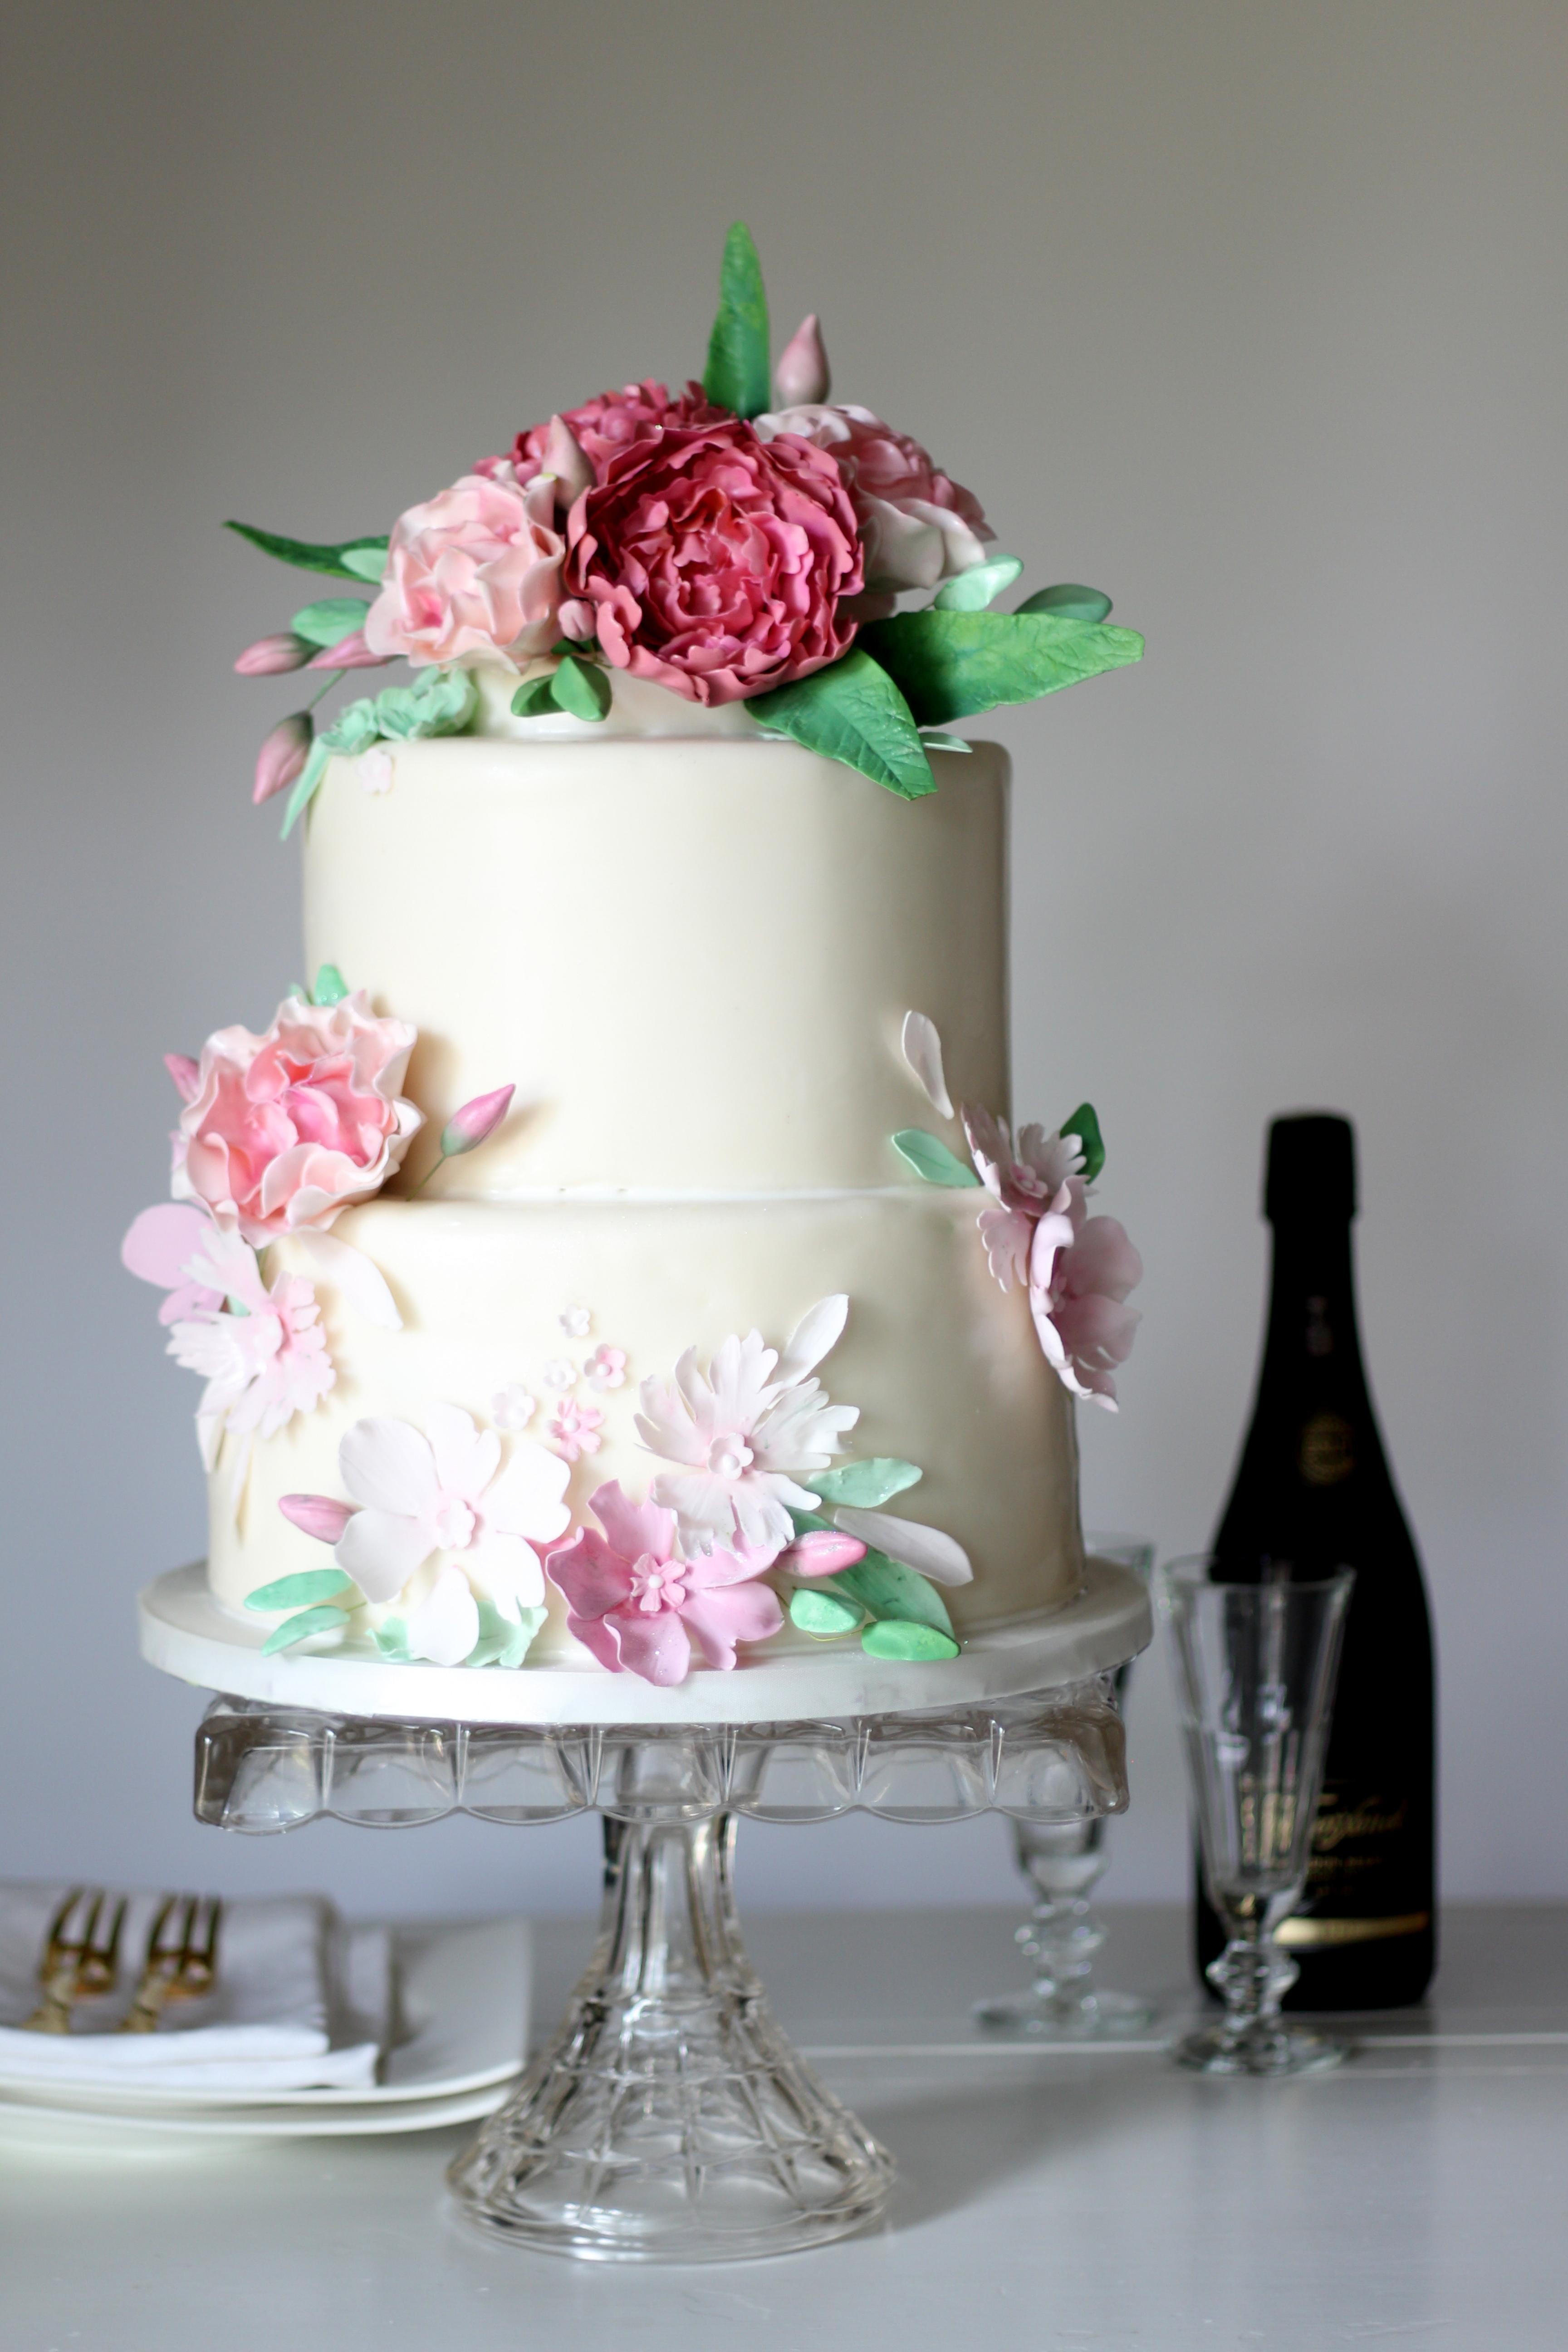 pink peony and rose shower cake.jpg